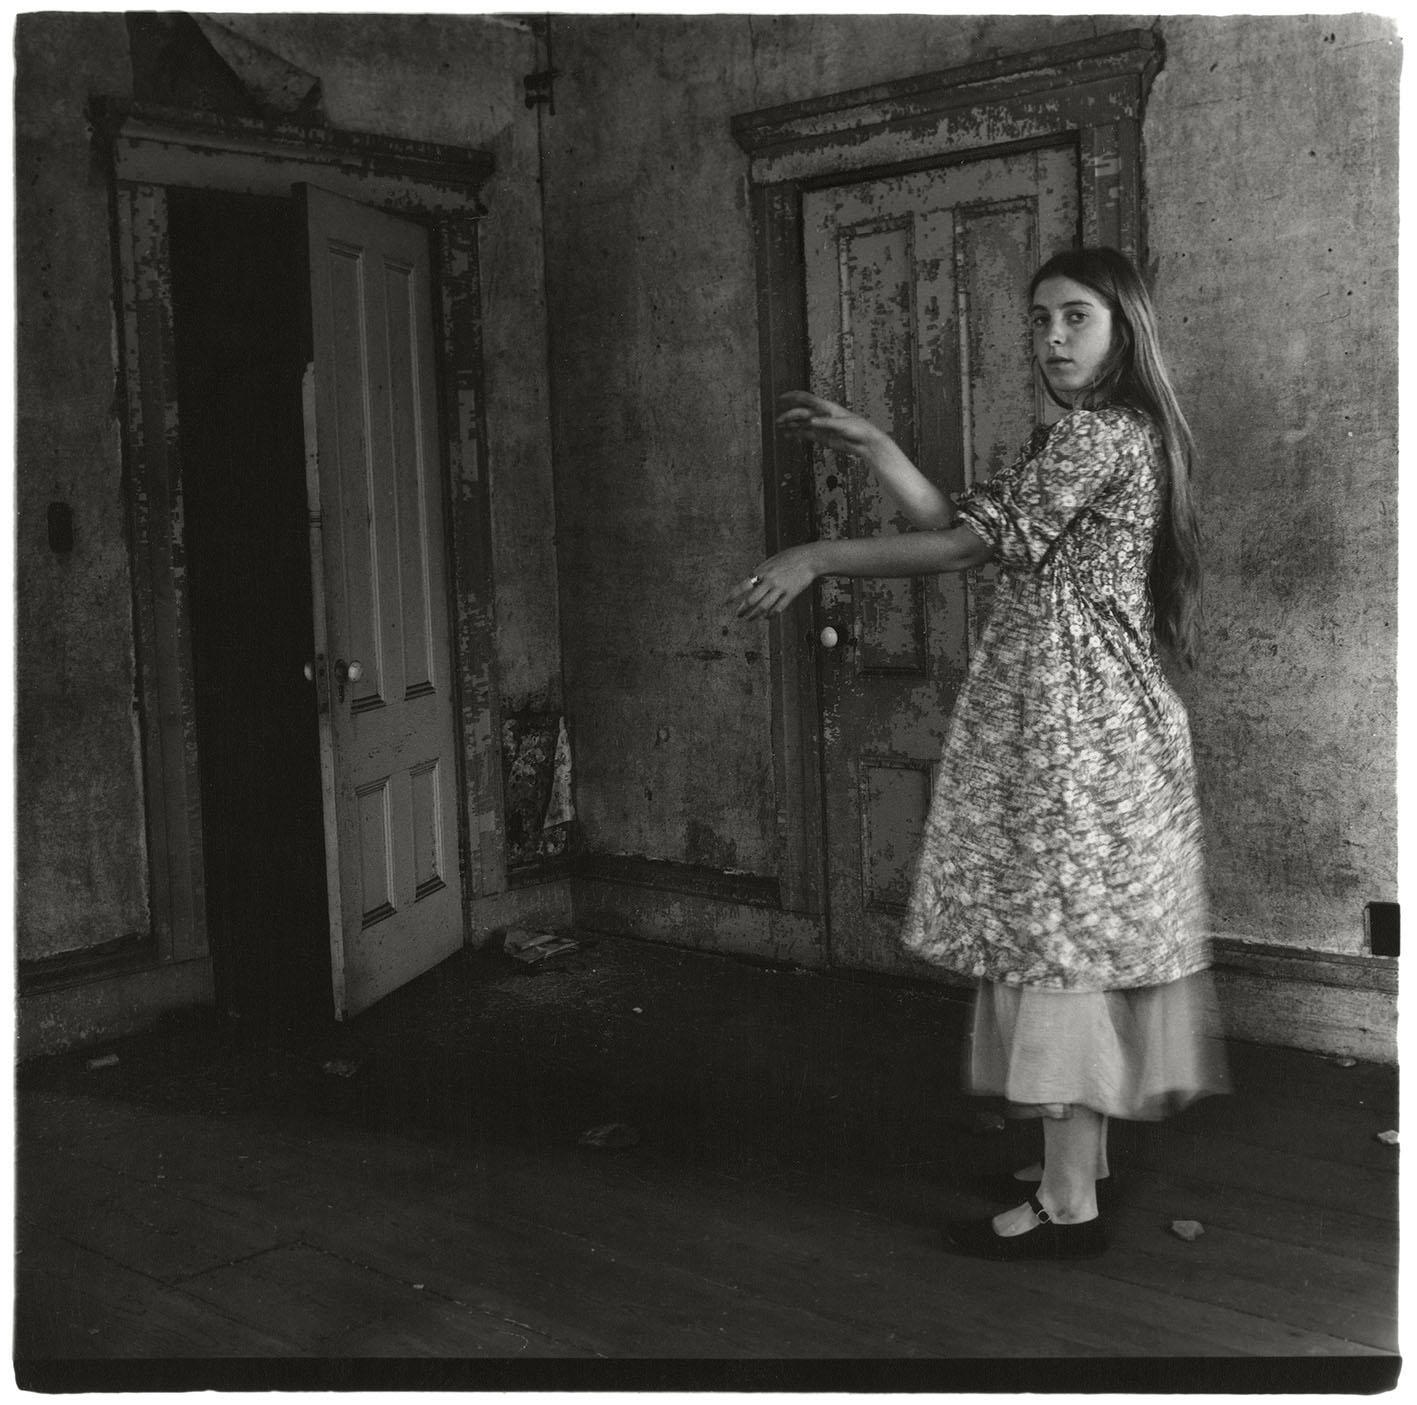 Francesca Woodman, Untitled, Providence, Rhode Island, 1975–1976. © Betty and George Woodman.